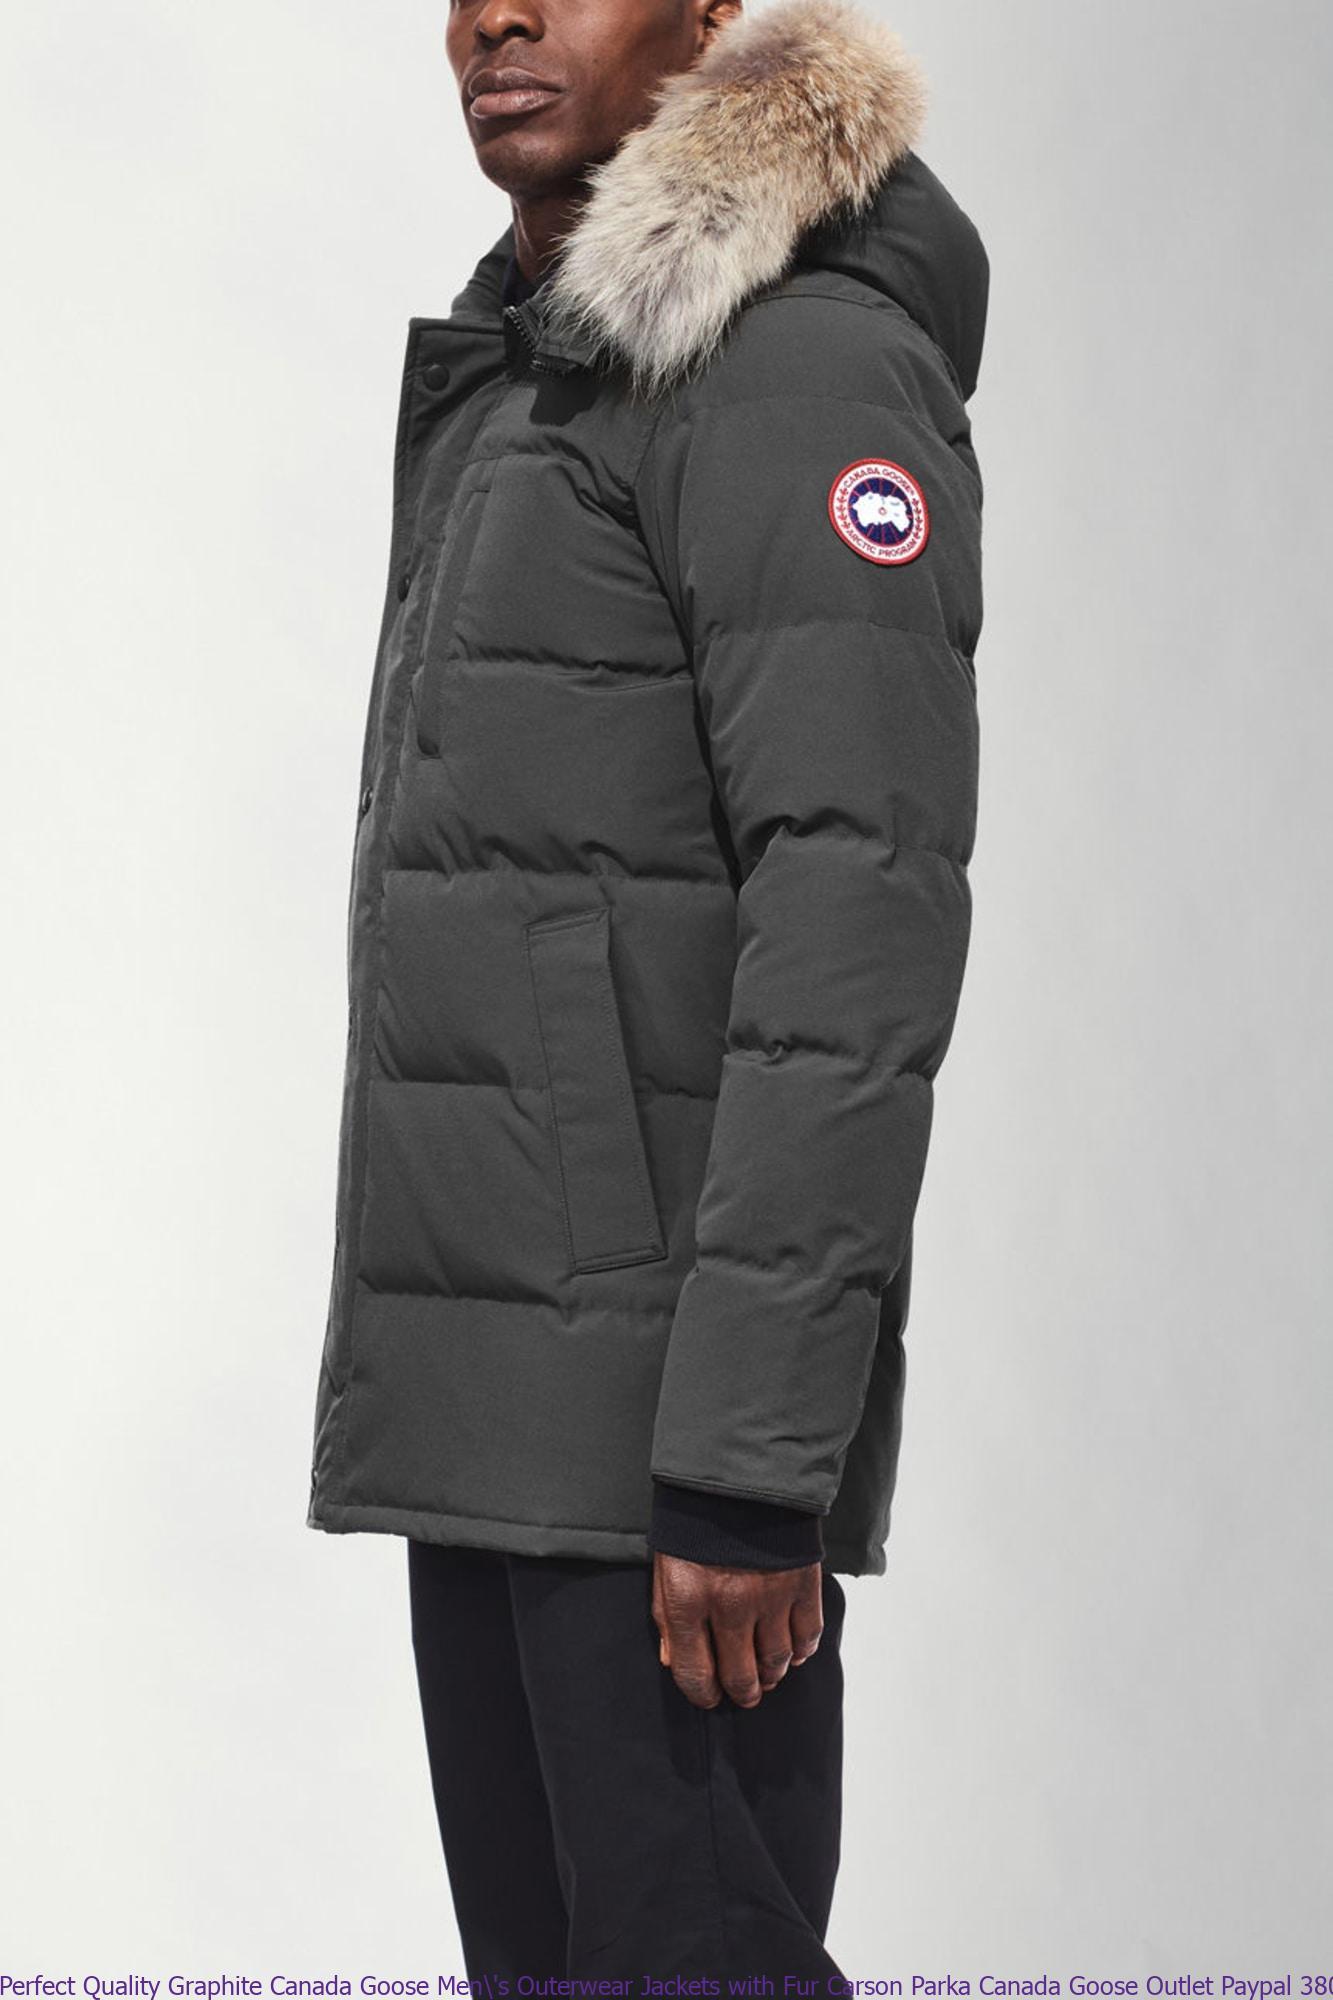 53e81ca24e07 Perfect Quality Graphite Canada Goose Men  s Outerwear Jackets with ...